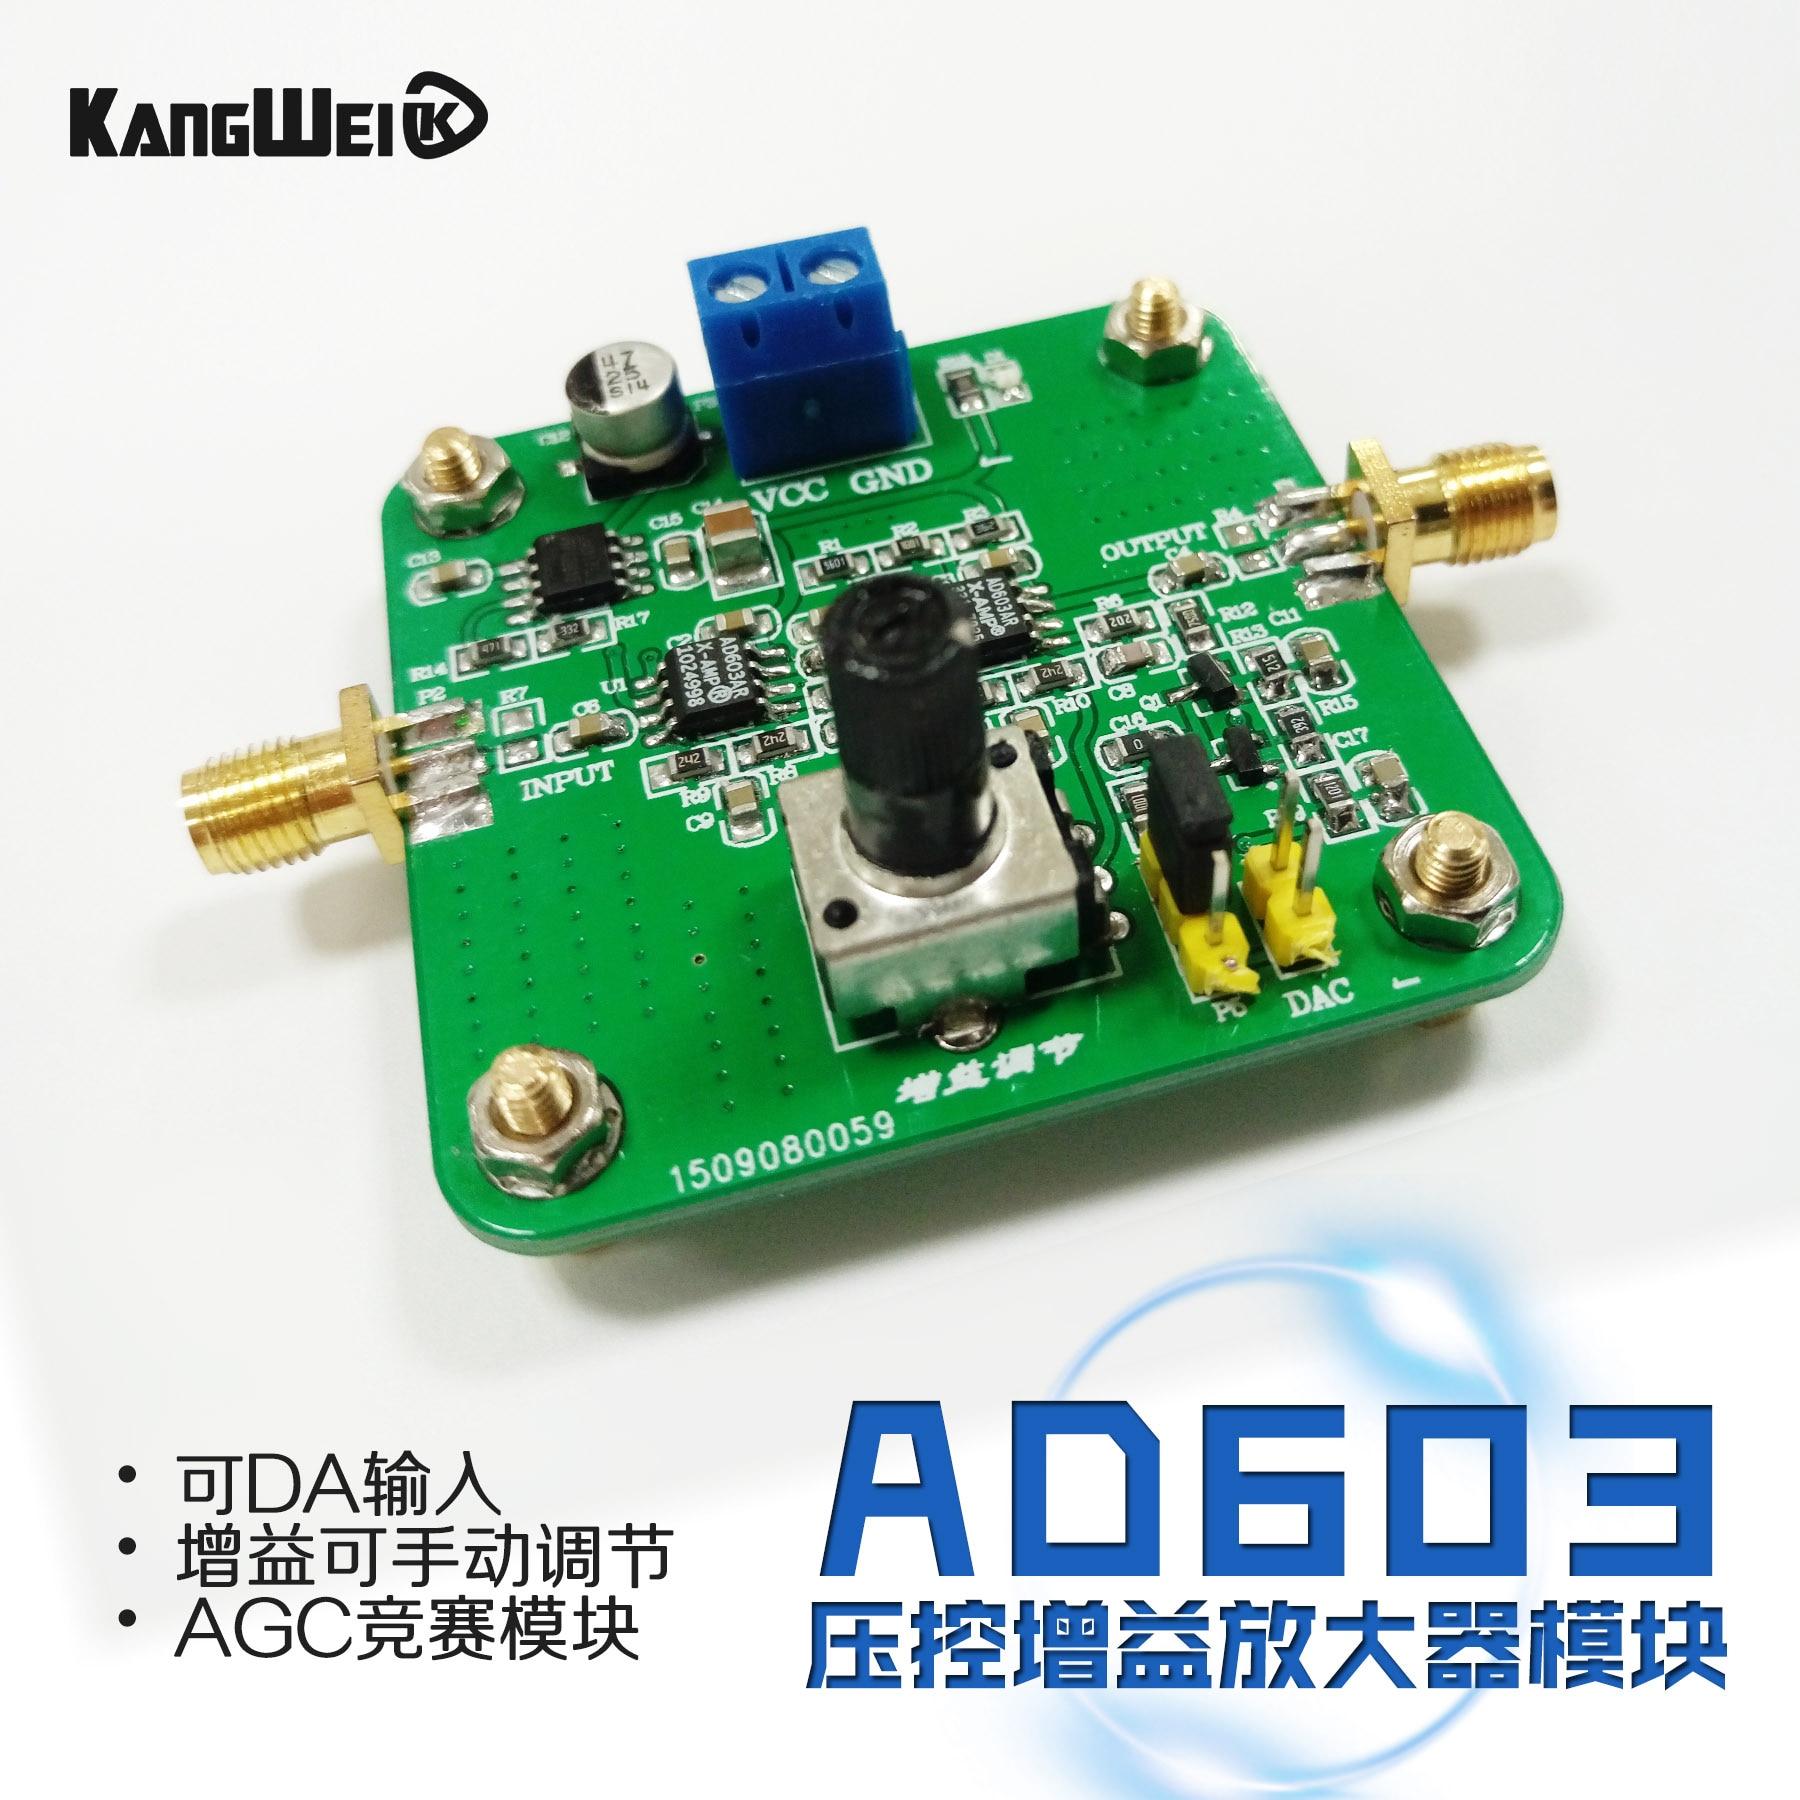 AD603 Adjustable Gain Amplifier Module DA Input Programmable Voltage Amplifier AGC Race Module велосипед cube reaction hybrid race 500 29 2018